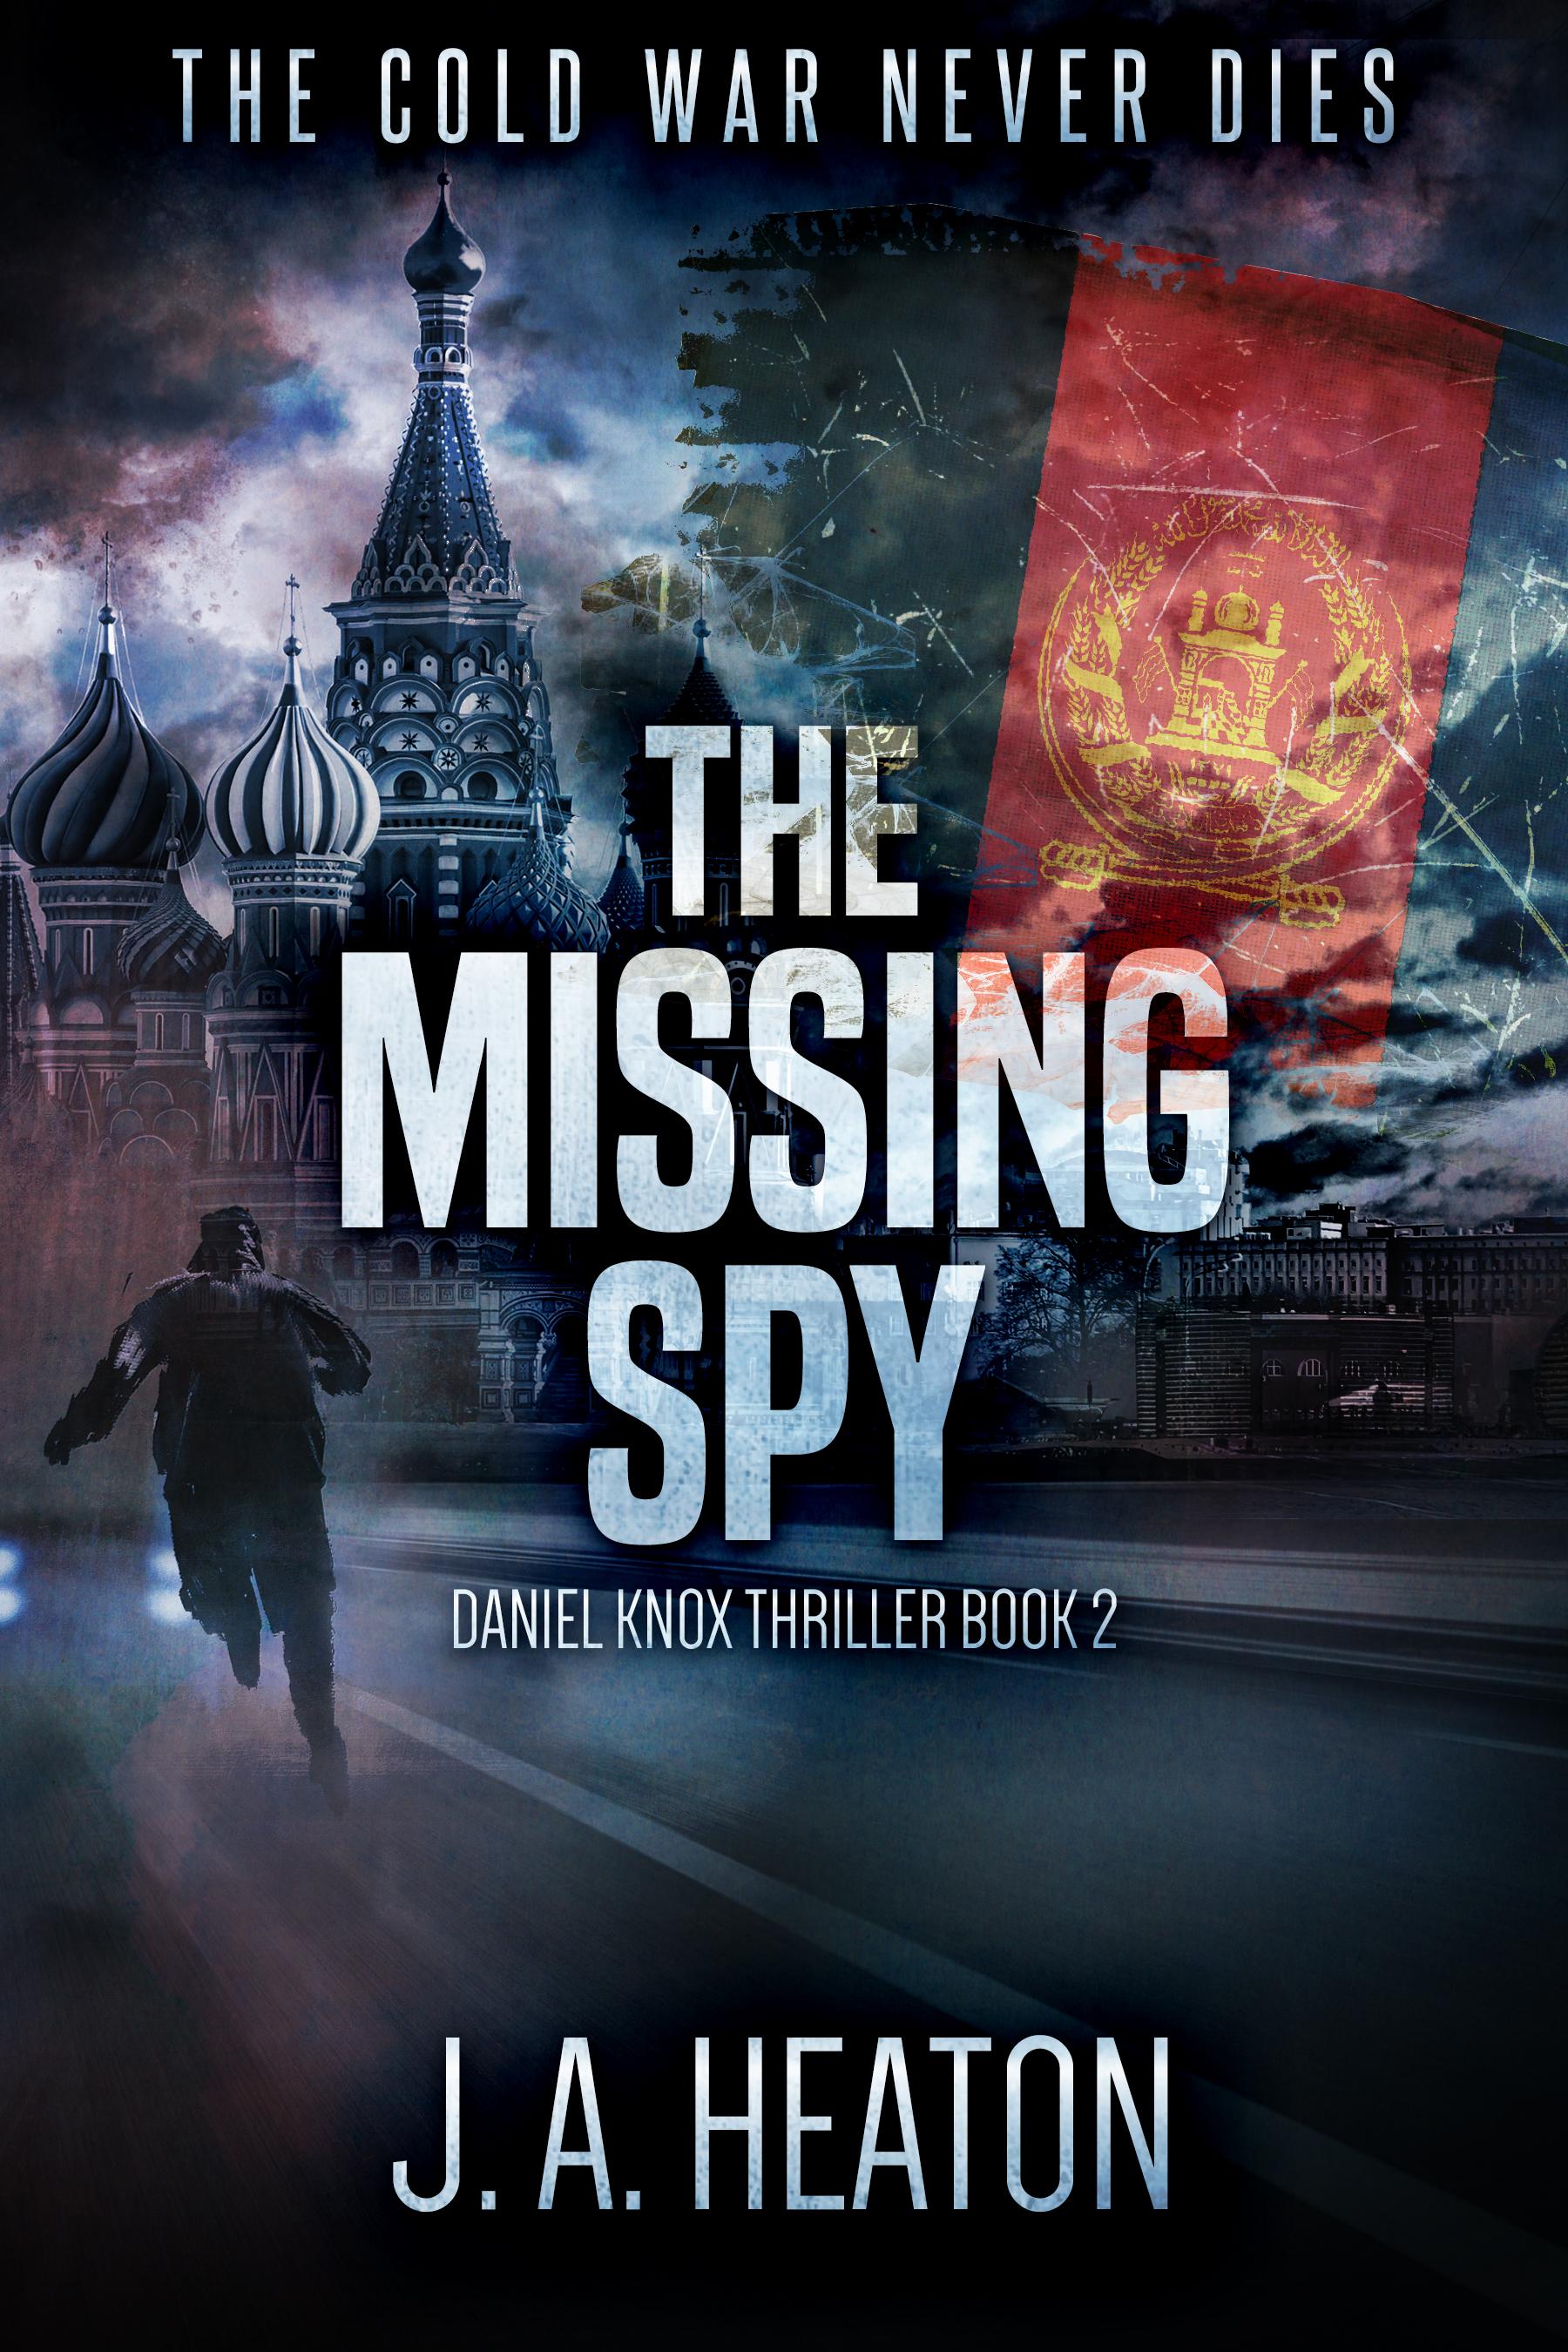 The-Missing-Spy-Main-File.jpg